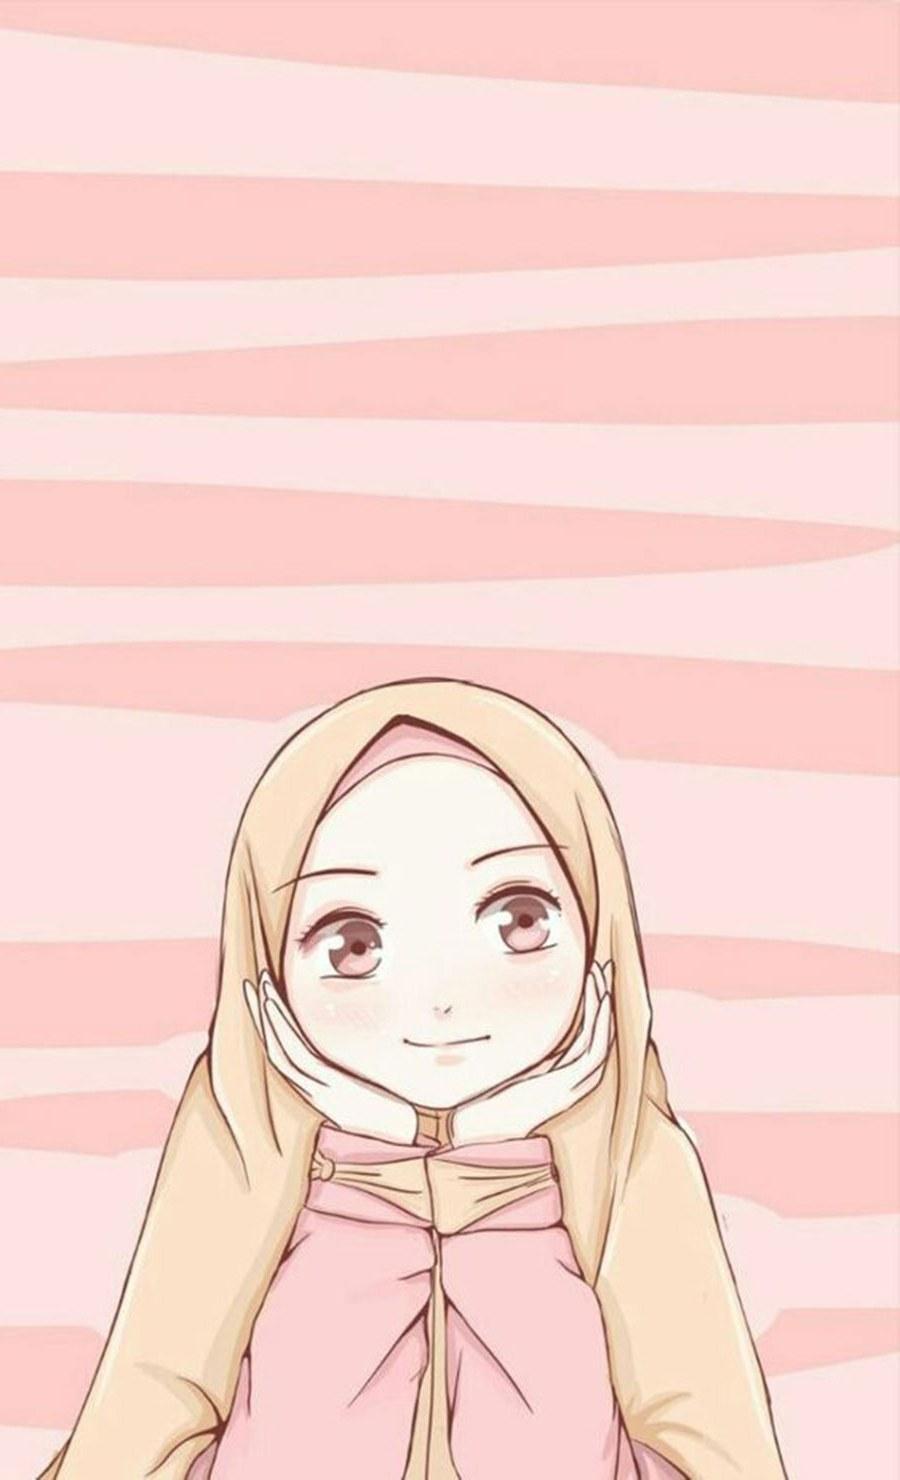 Inspirasi Muslimah Kartun Lucu U3dh 1000 Gambar Kartun Muslimah Cantik Bercadar Kacamata El